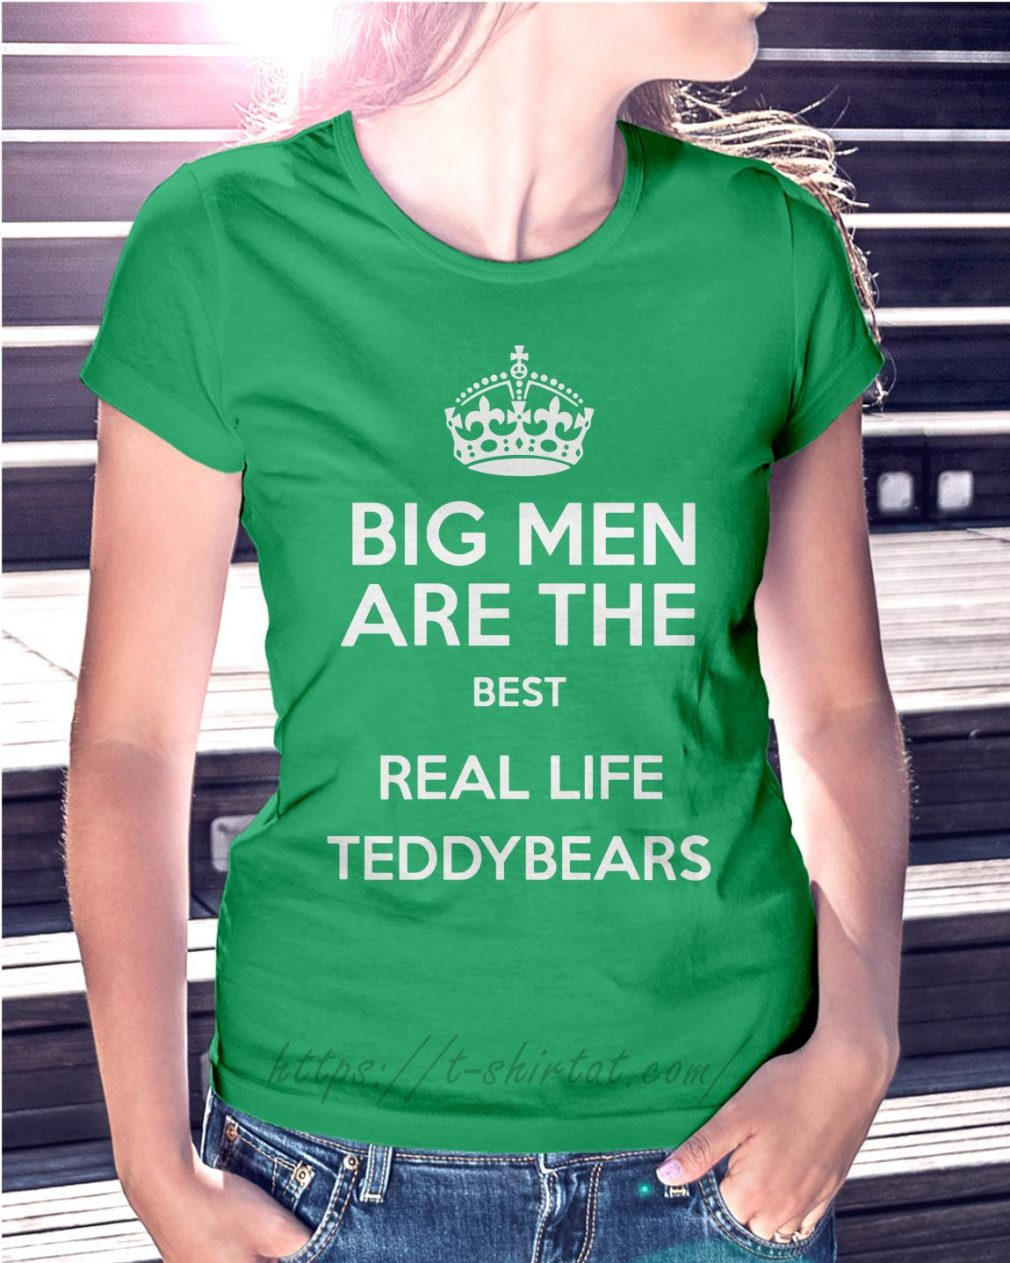 Big men are the best real life teddybears Ladies Tee green